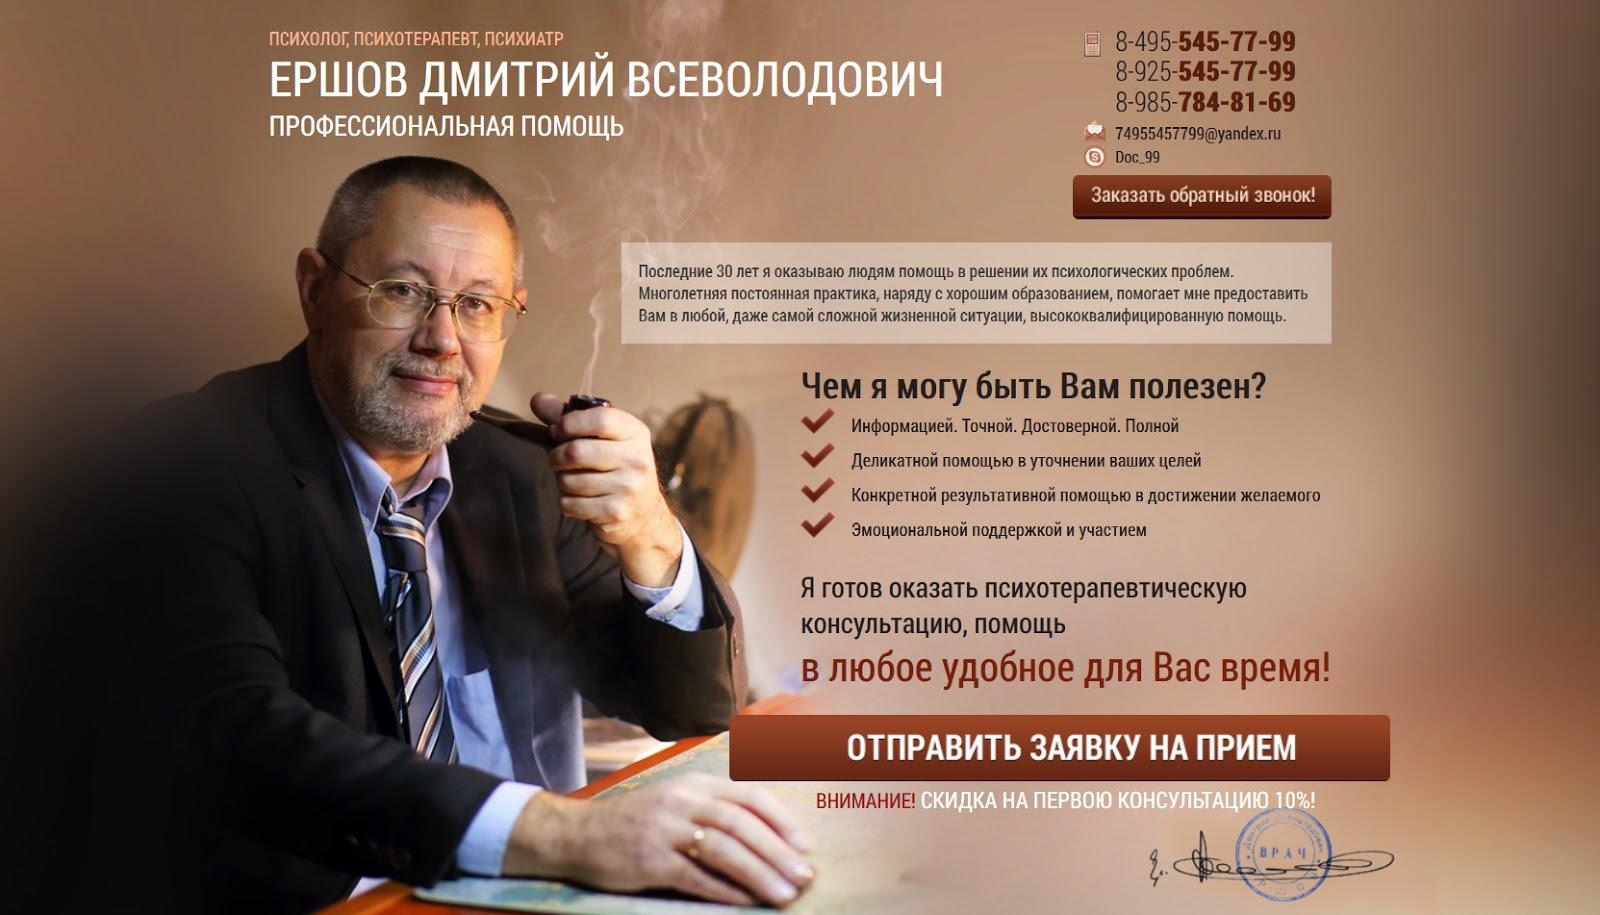 Услуги психолога бизнес план бизнес план бутика шоколада